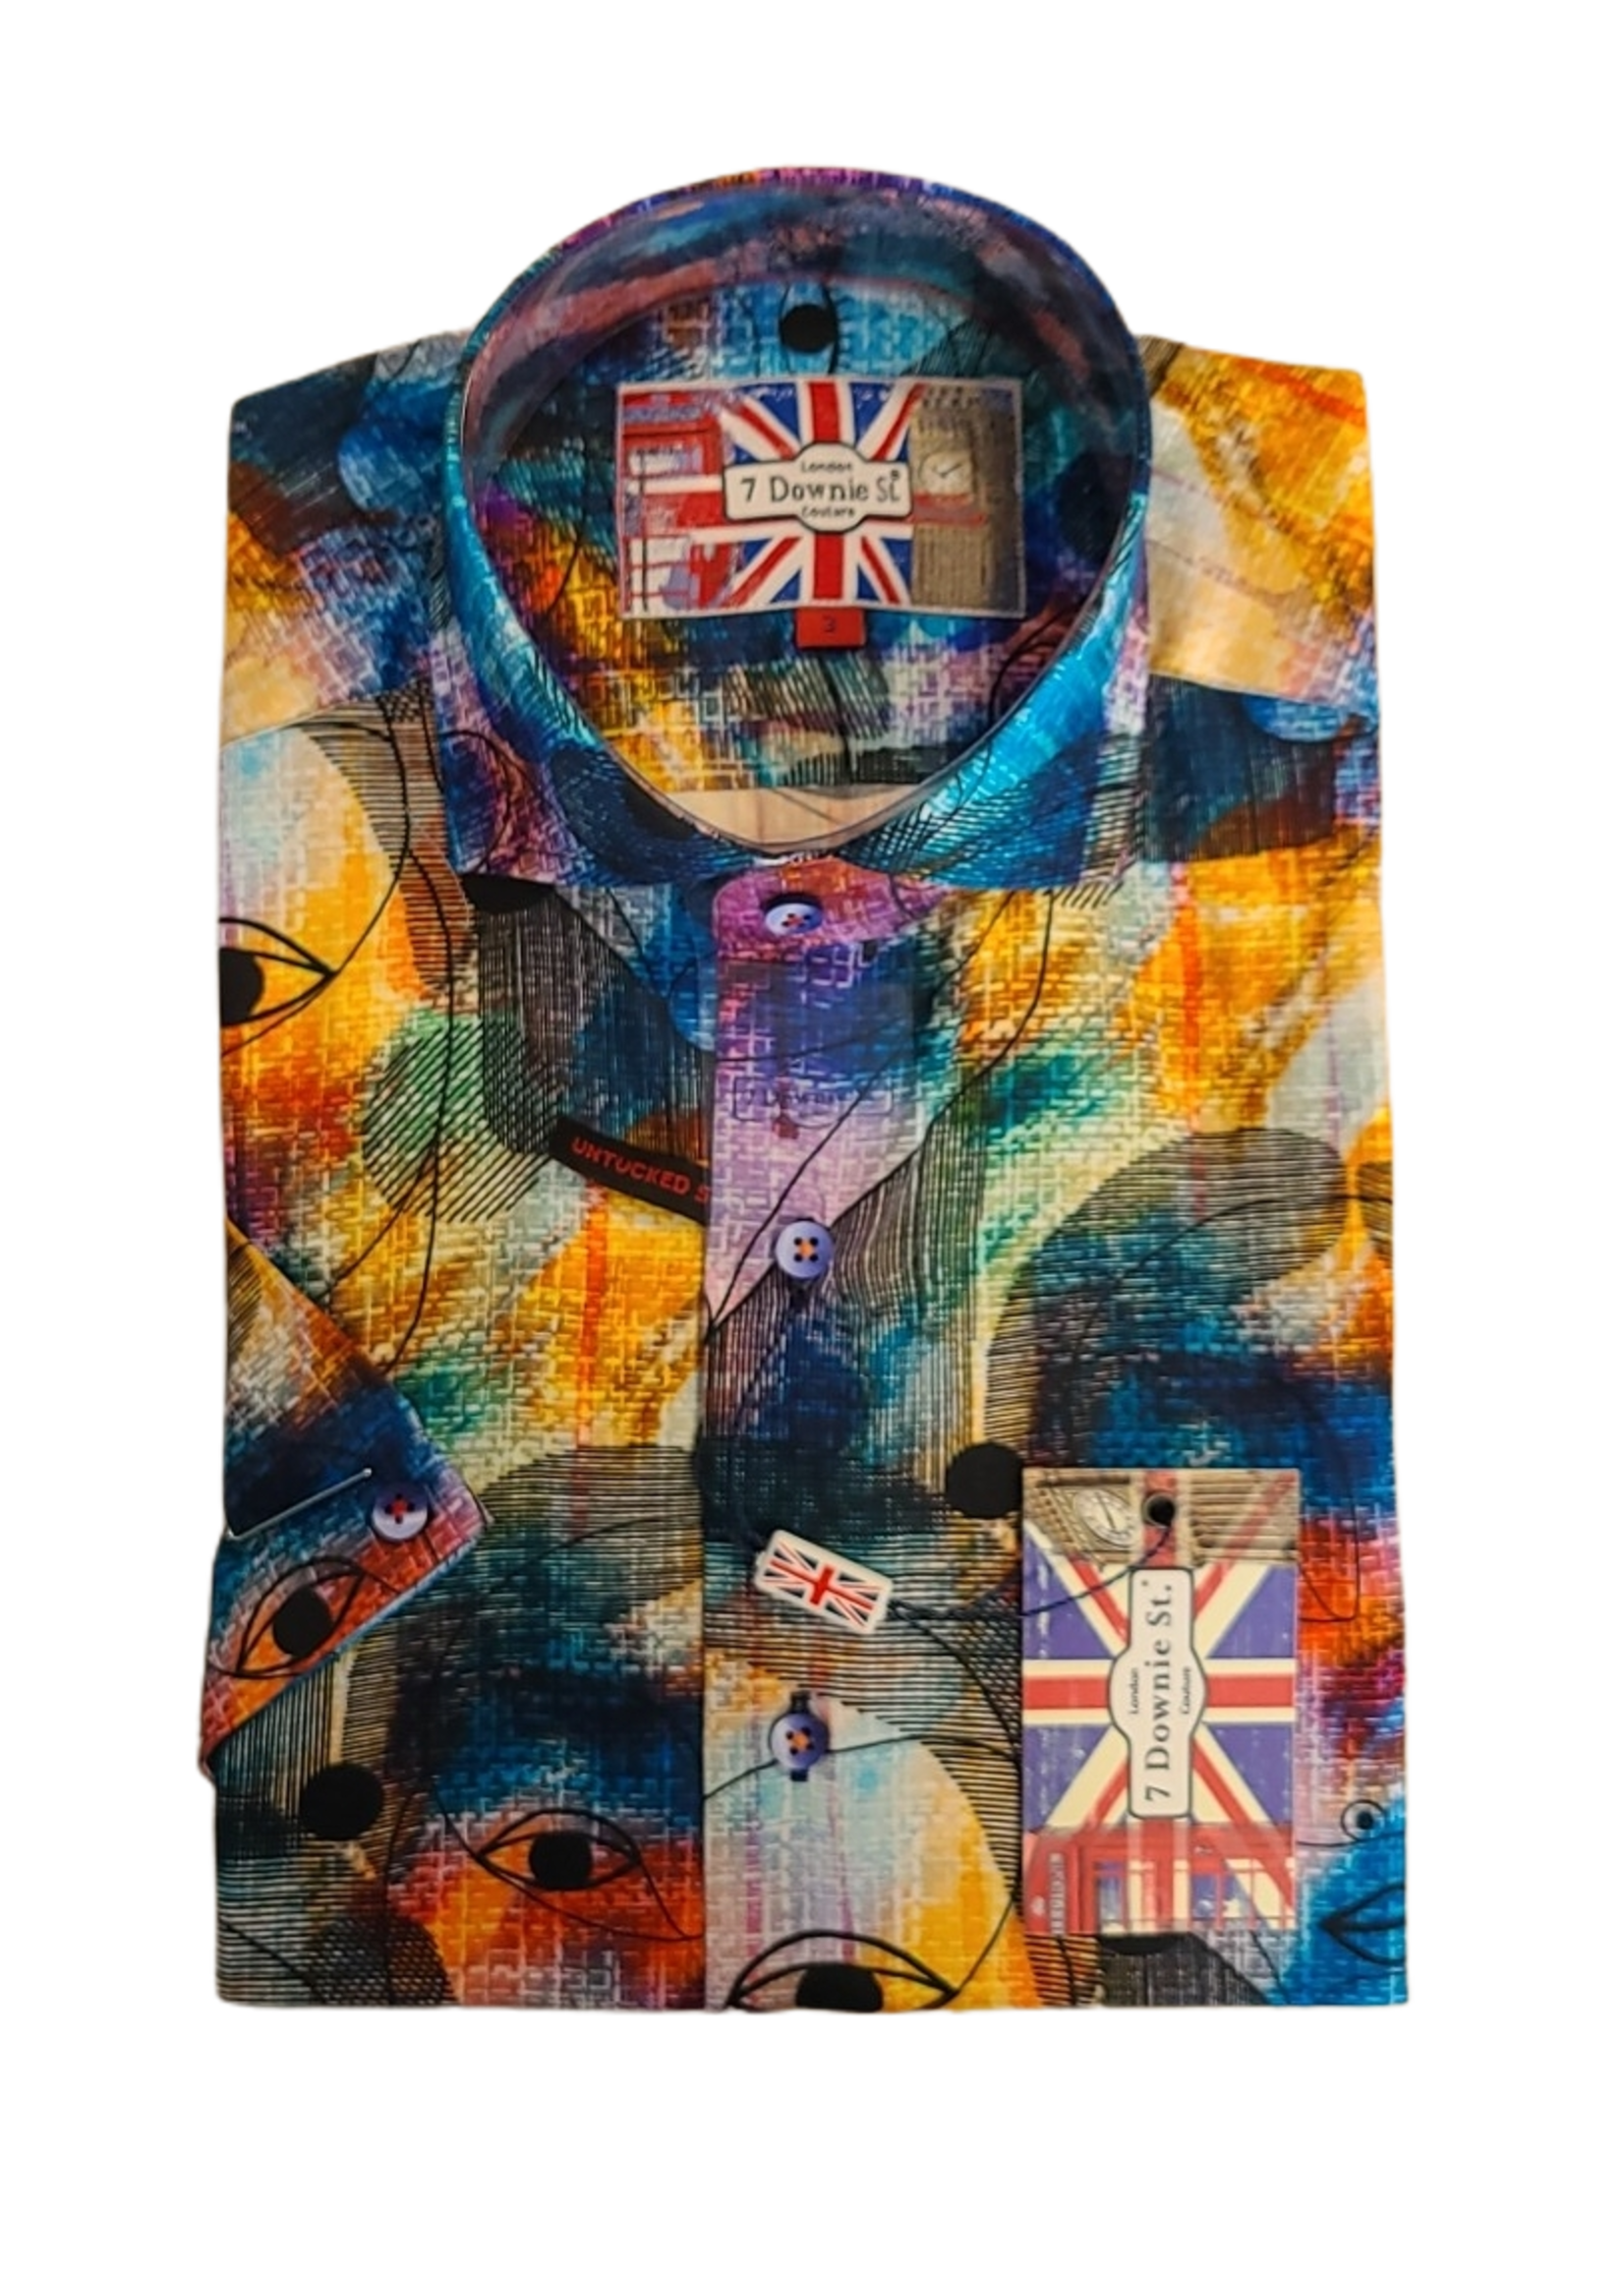 7 Downie St. 7 Downie St. Short Sleeve Shirt 7008